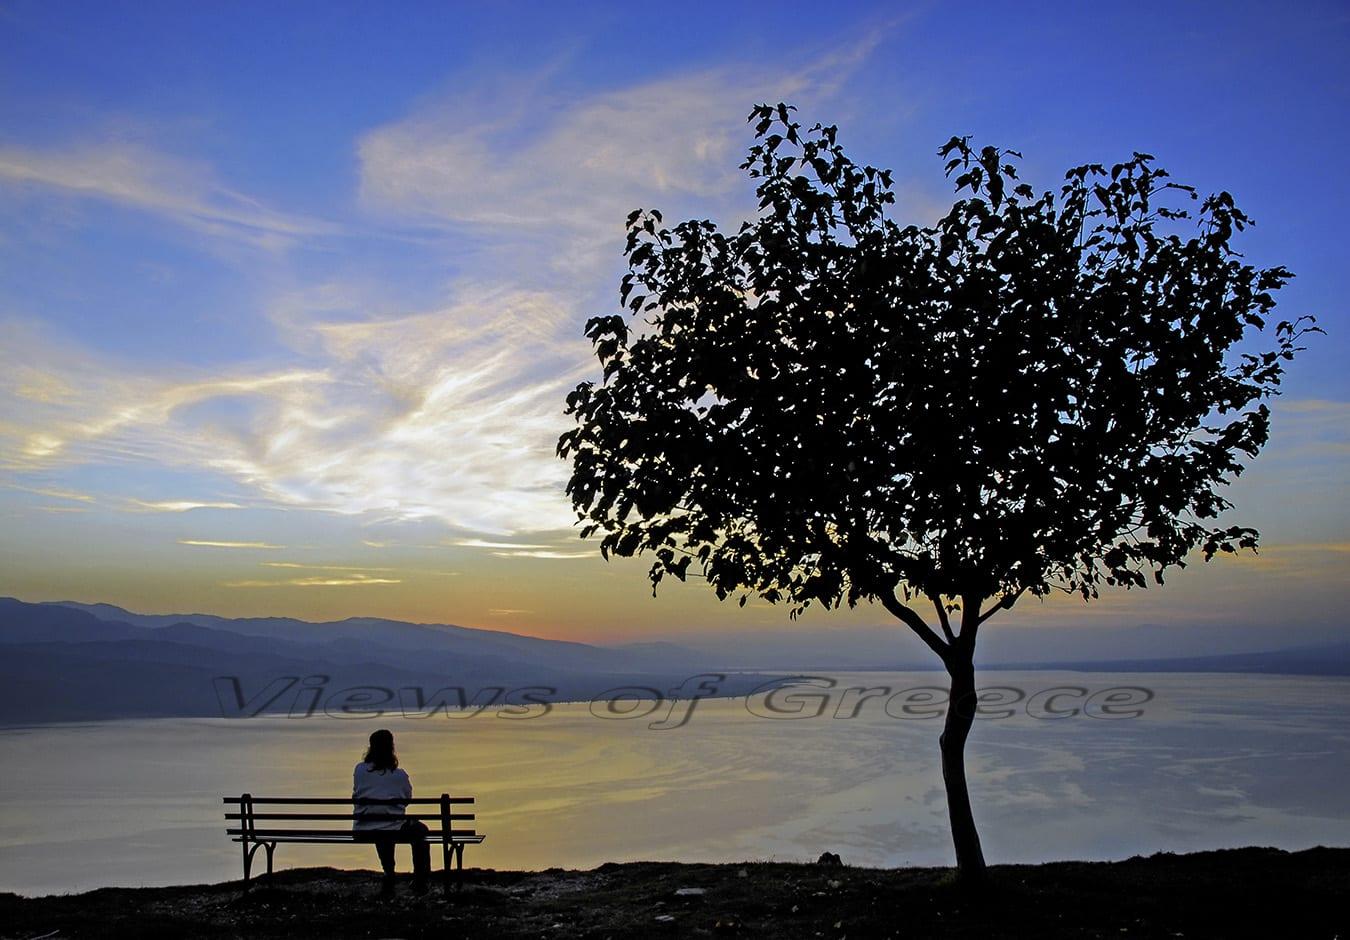 lake, nature, landscape, travel, greece, reflection, agrinio, largest, calm, fishing, mountain lake reflection, aitoloakarnania, lake Trihonida, Τριχωνίδα λίμνη, νομός Αιτωλοακαρνανίας, Θέρμο, διαδρομές, αποδράσεις, ηλιοβασίλεμα, δειλινό, καταρράκτης, νερόμυλος, Θέρμο, αρχαίο Θέρμο